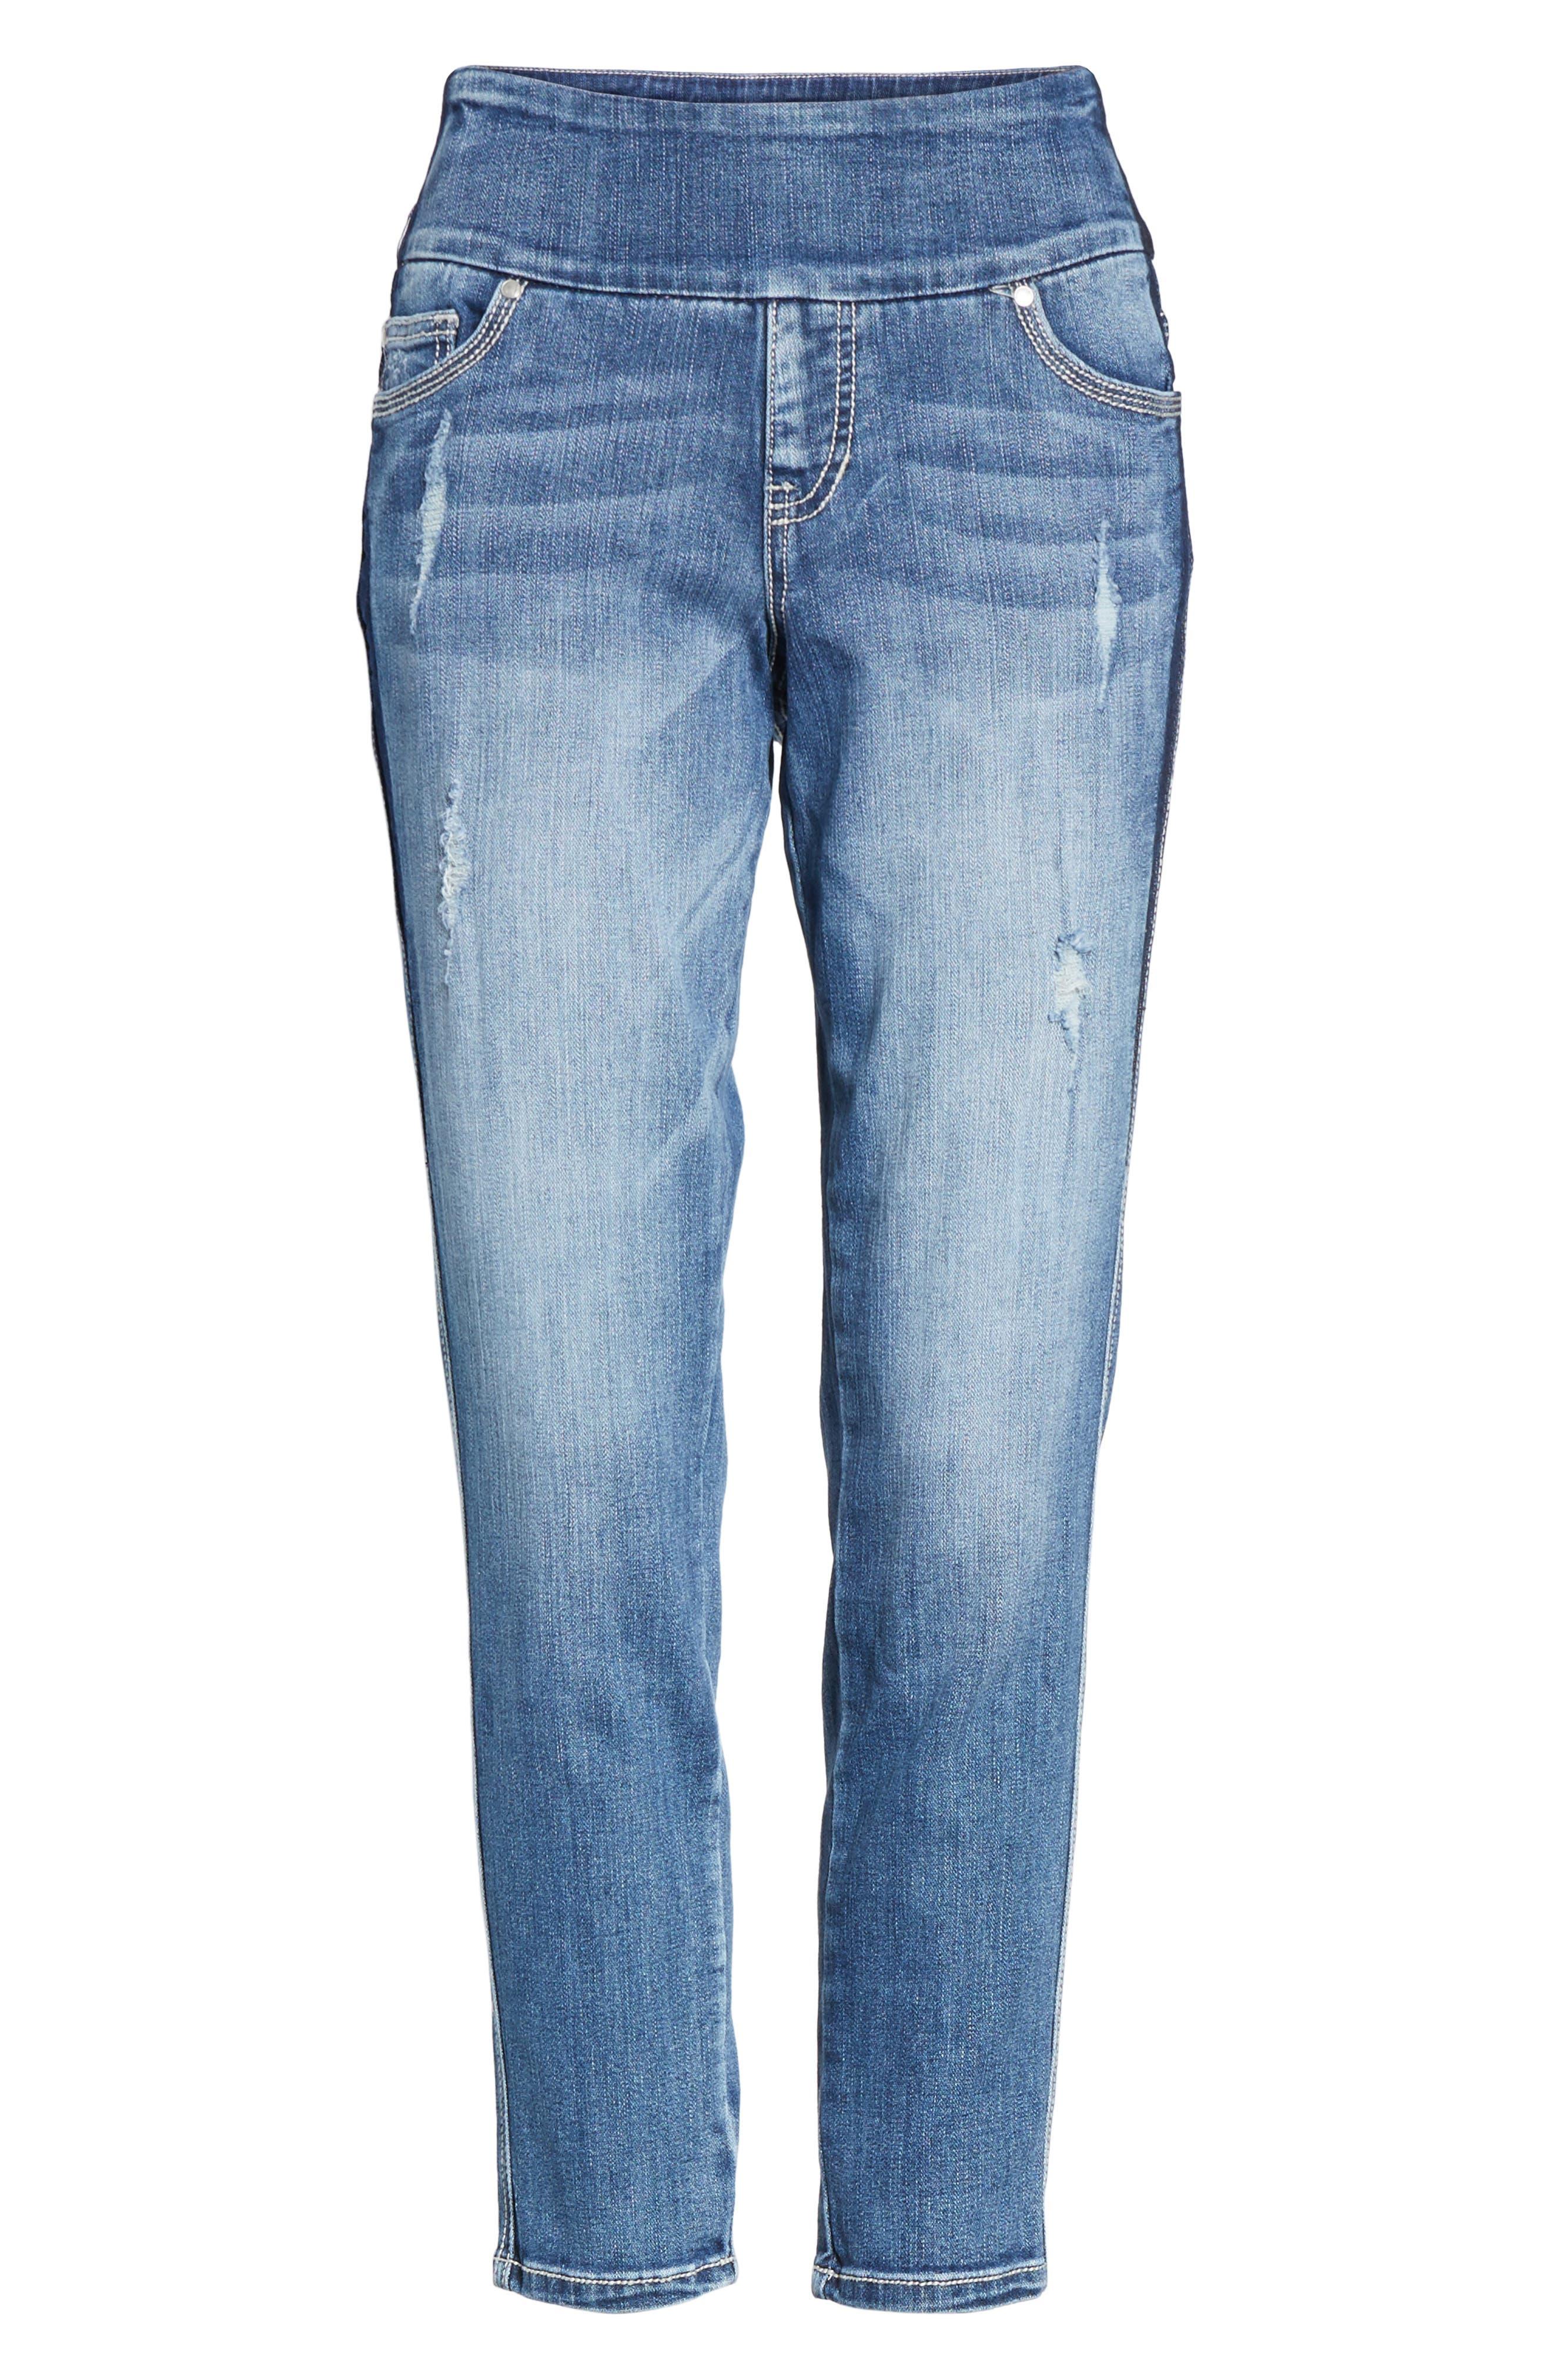 Nora Marta Stretch Skinny Jeans,                             Alternate thumbnail 6, color,                             420